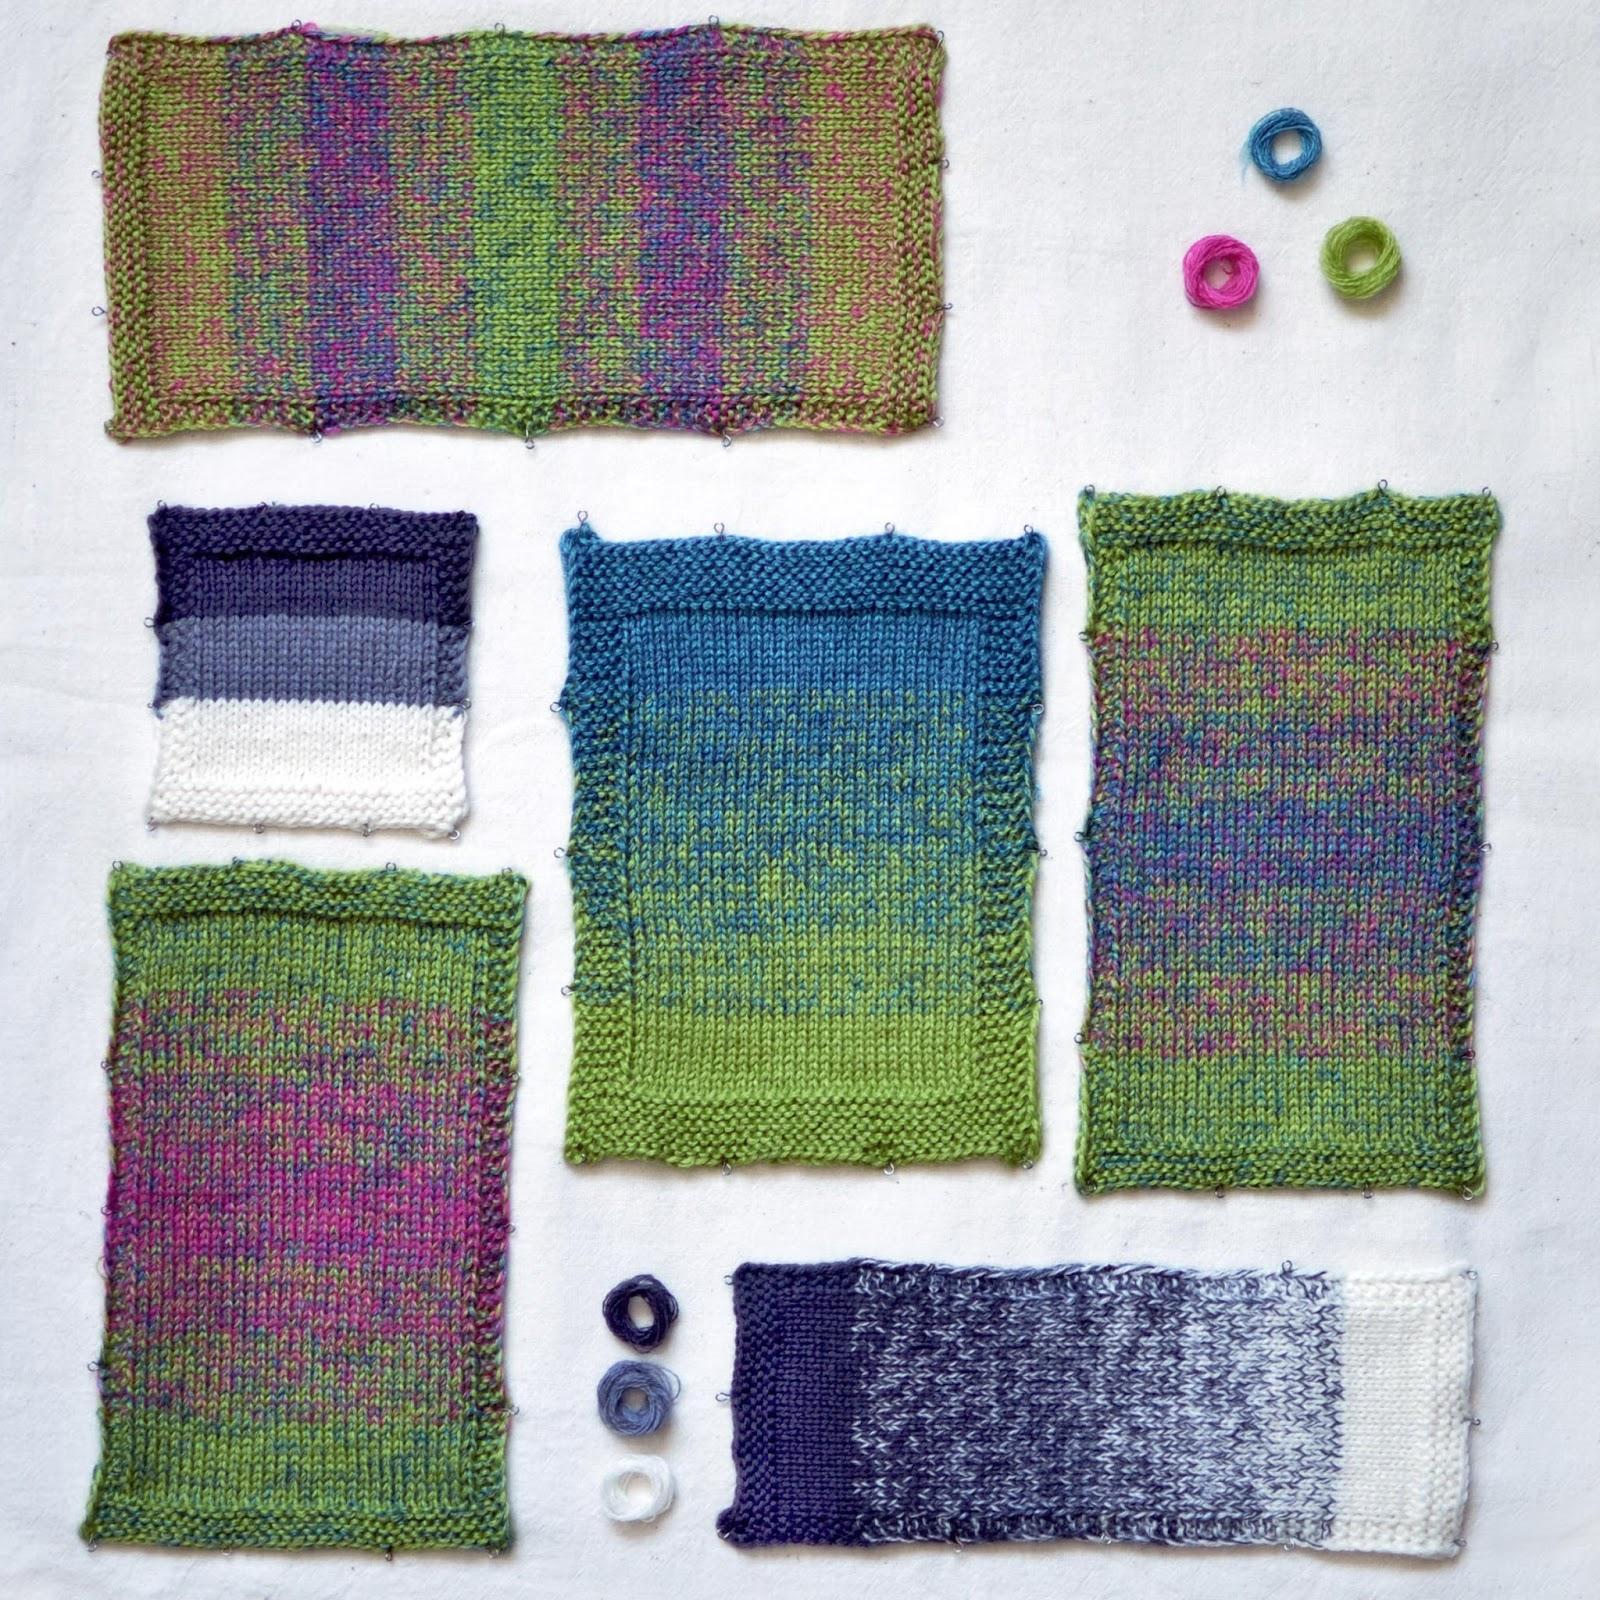 Tru Knitting работа с цветом деграде меланж